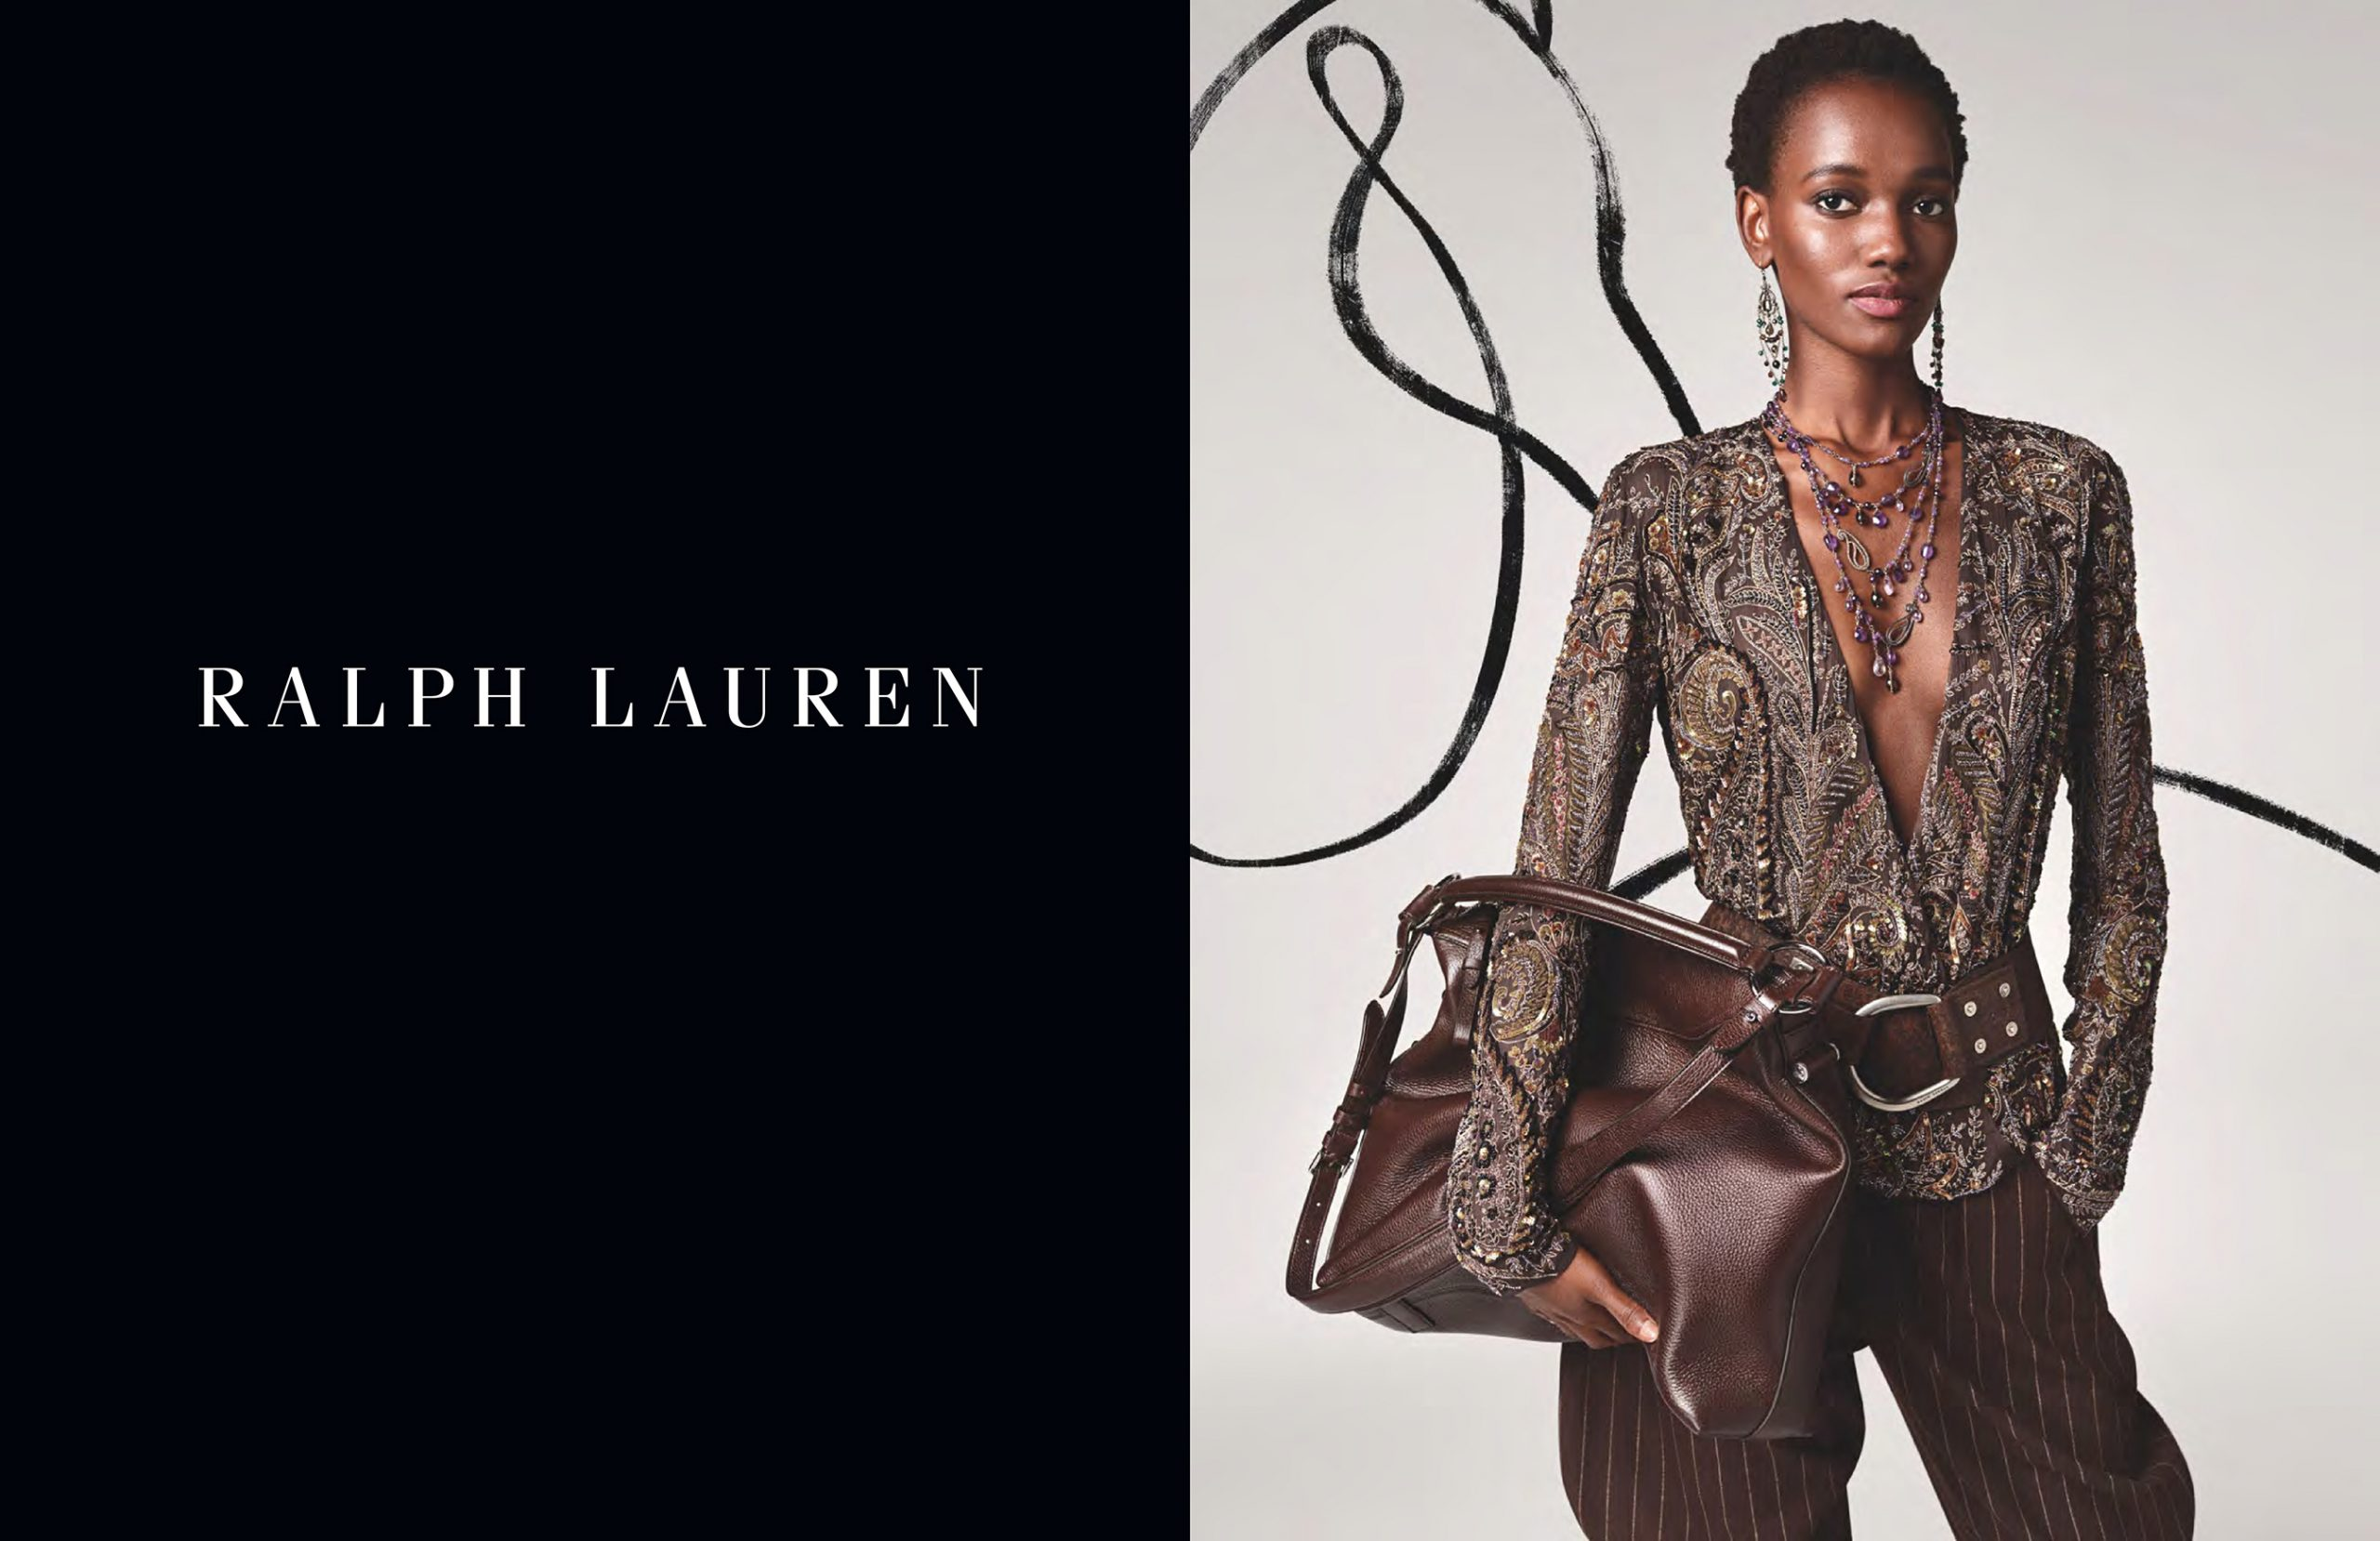 Ralph Lauren Fall 2020 Ad Campaign Film & Photos